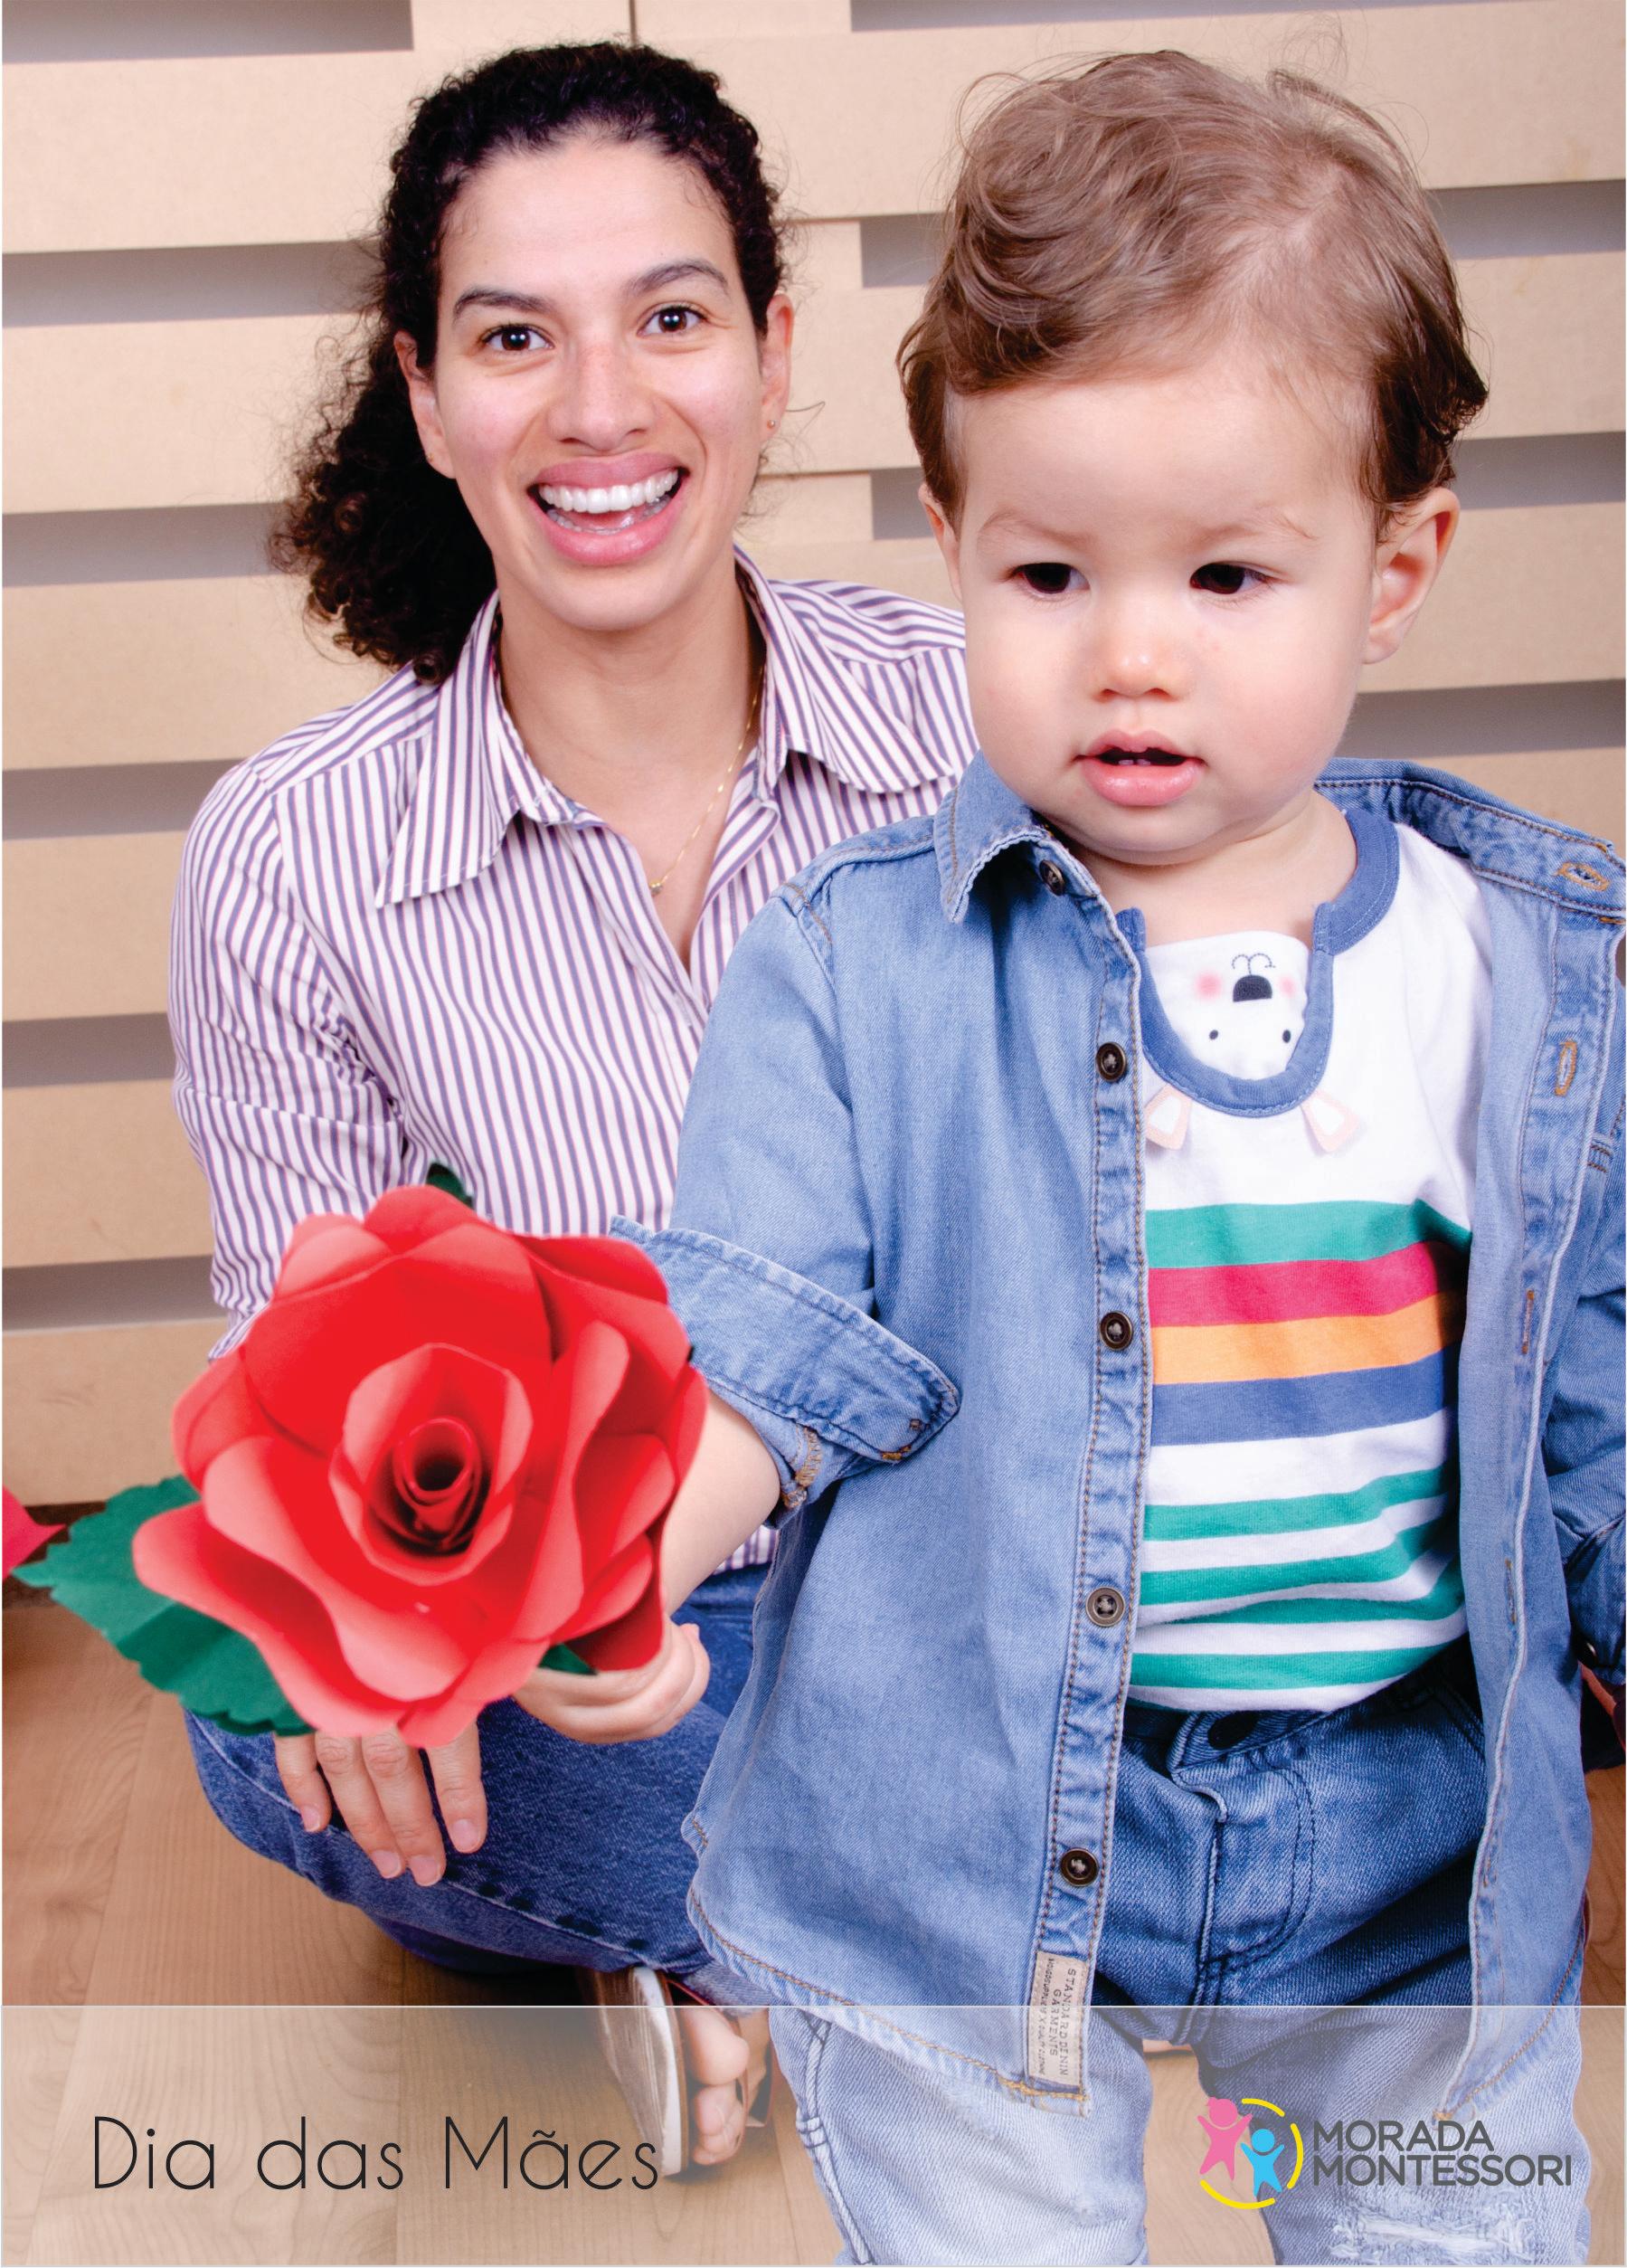 Dia das Mães - MS